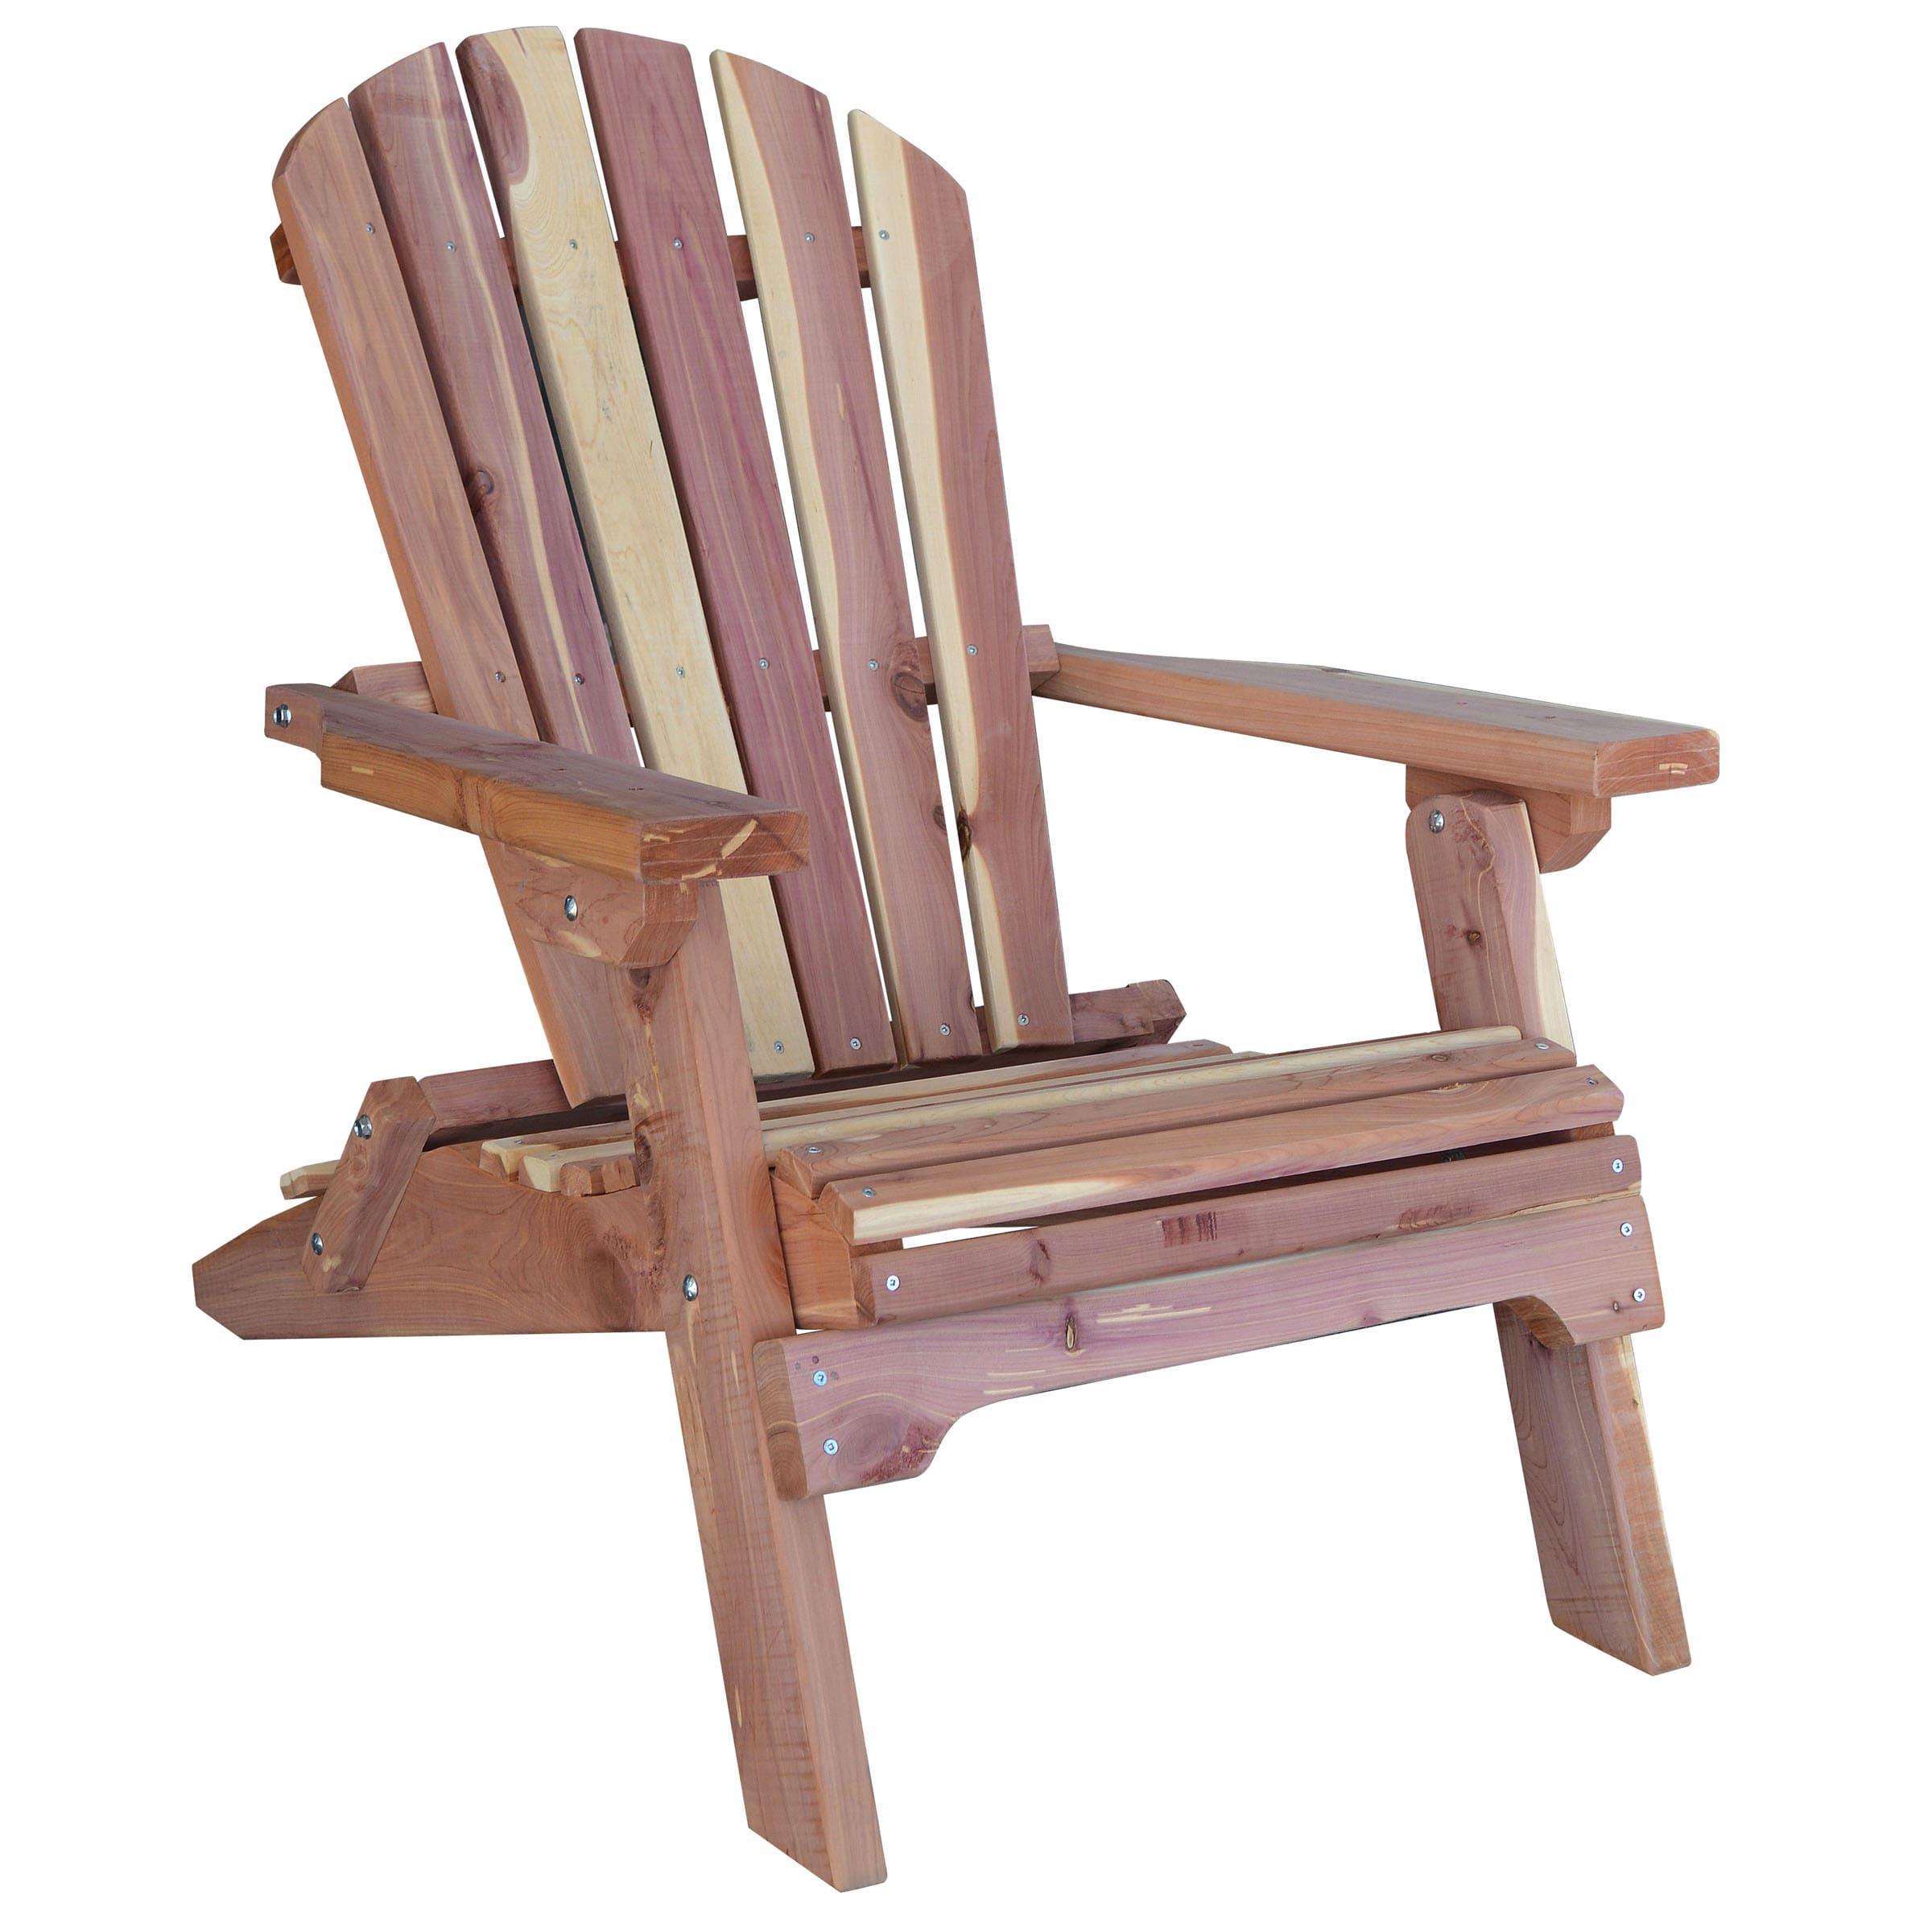 AmeriHome Amish Made Folding Adirondack Chair, Brown, Siz...